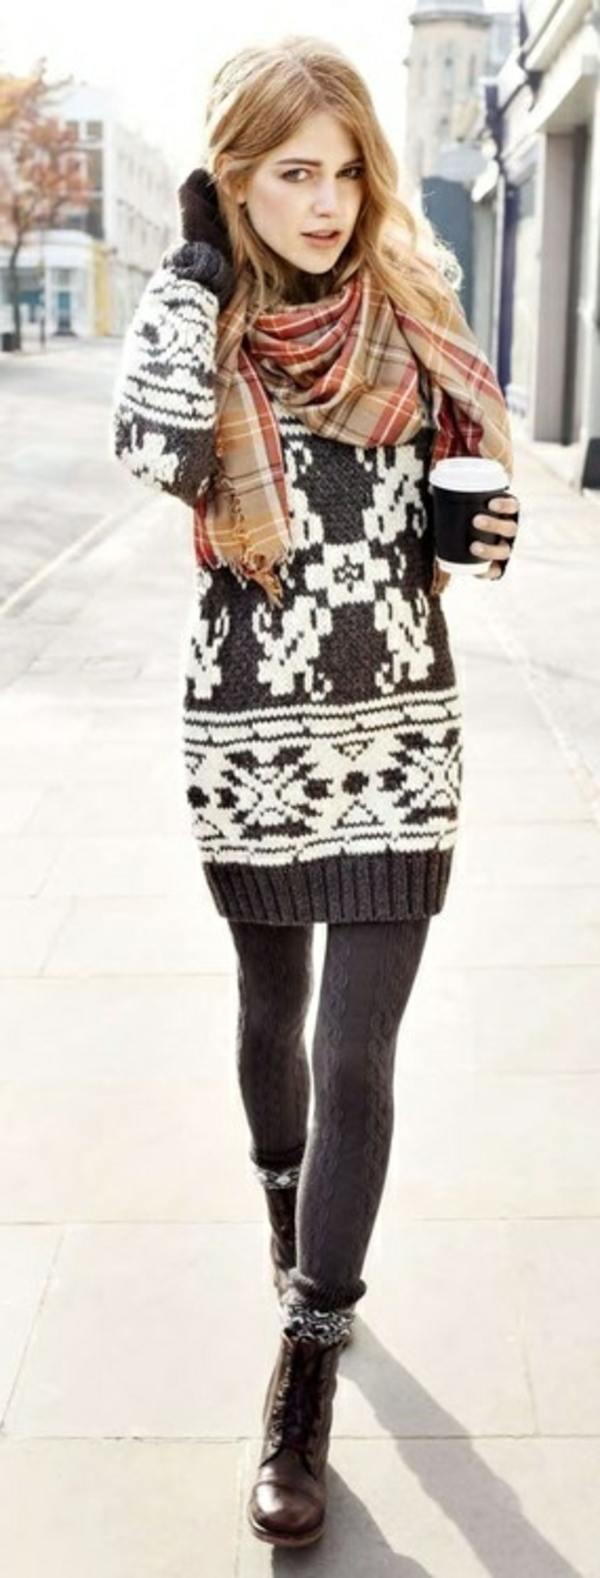 La robe pull pour tous les styles - Idee tenue hiver ...